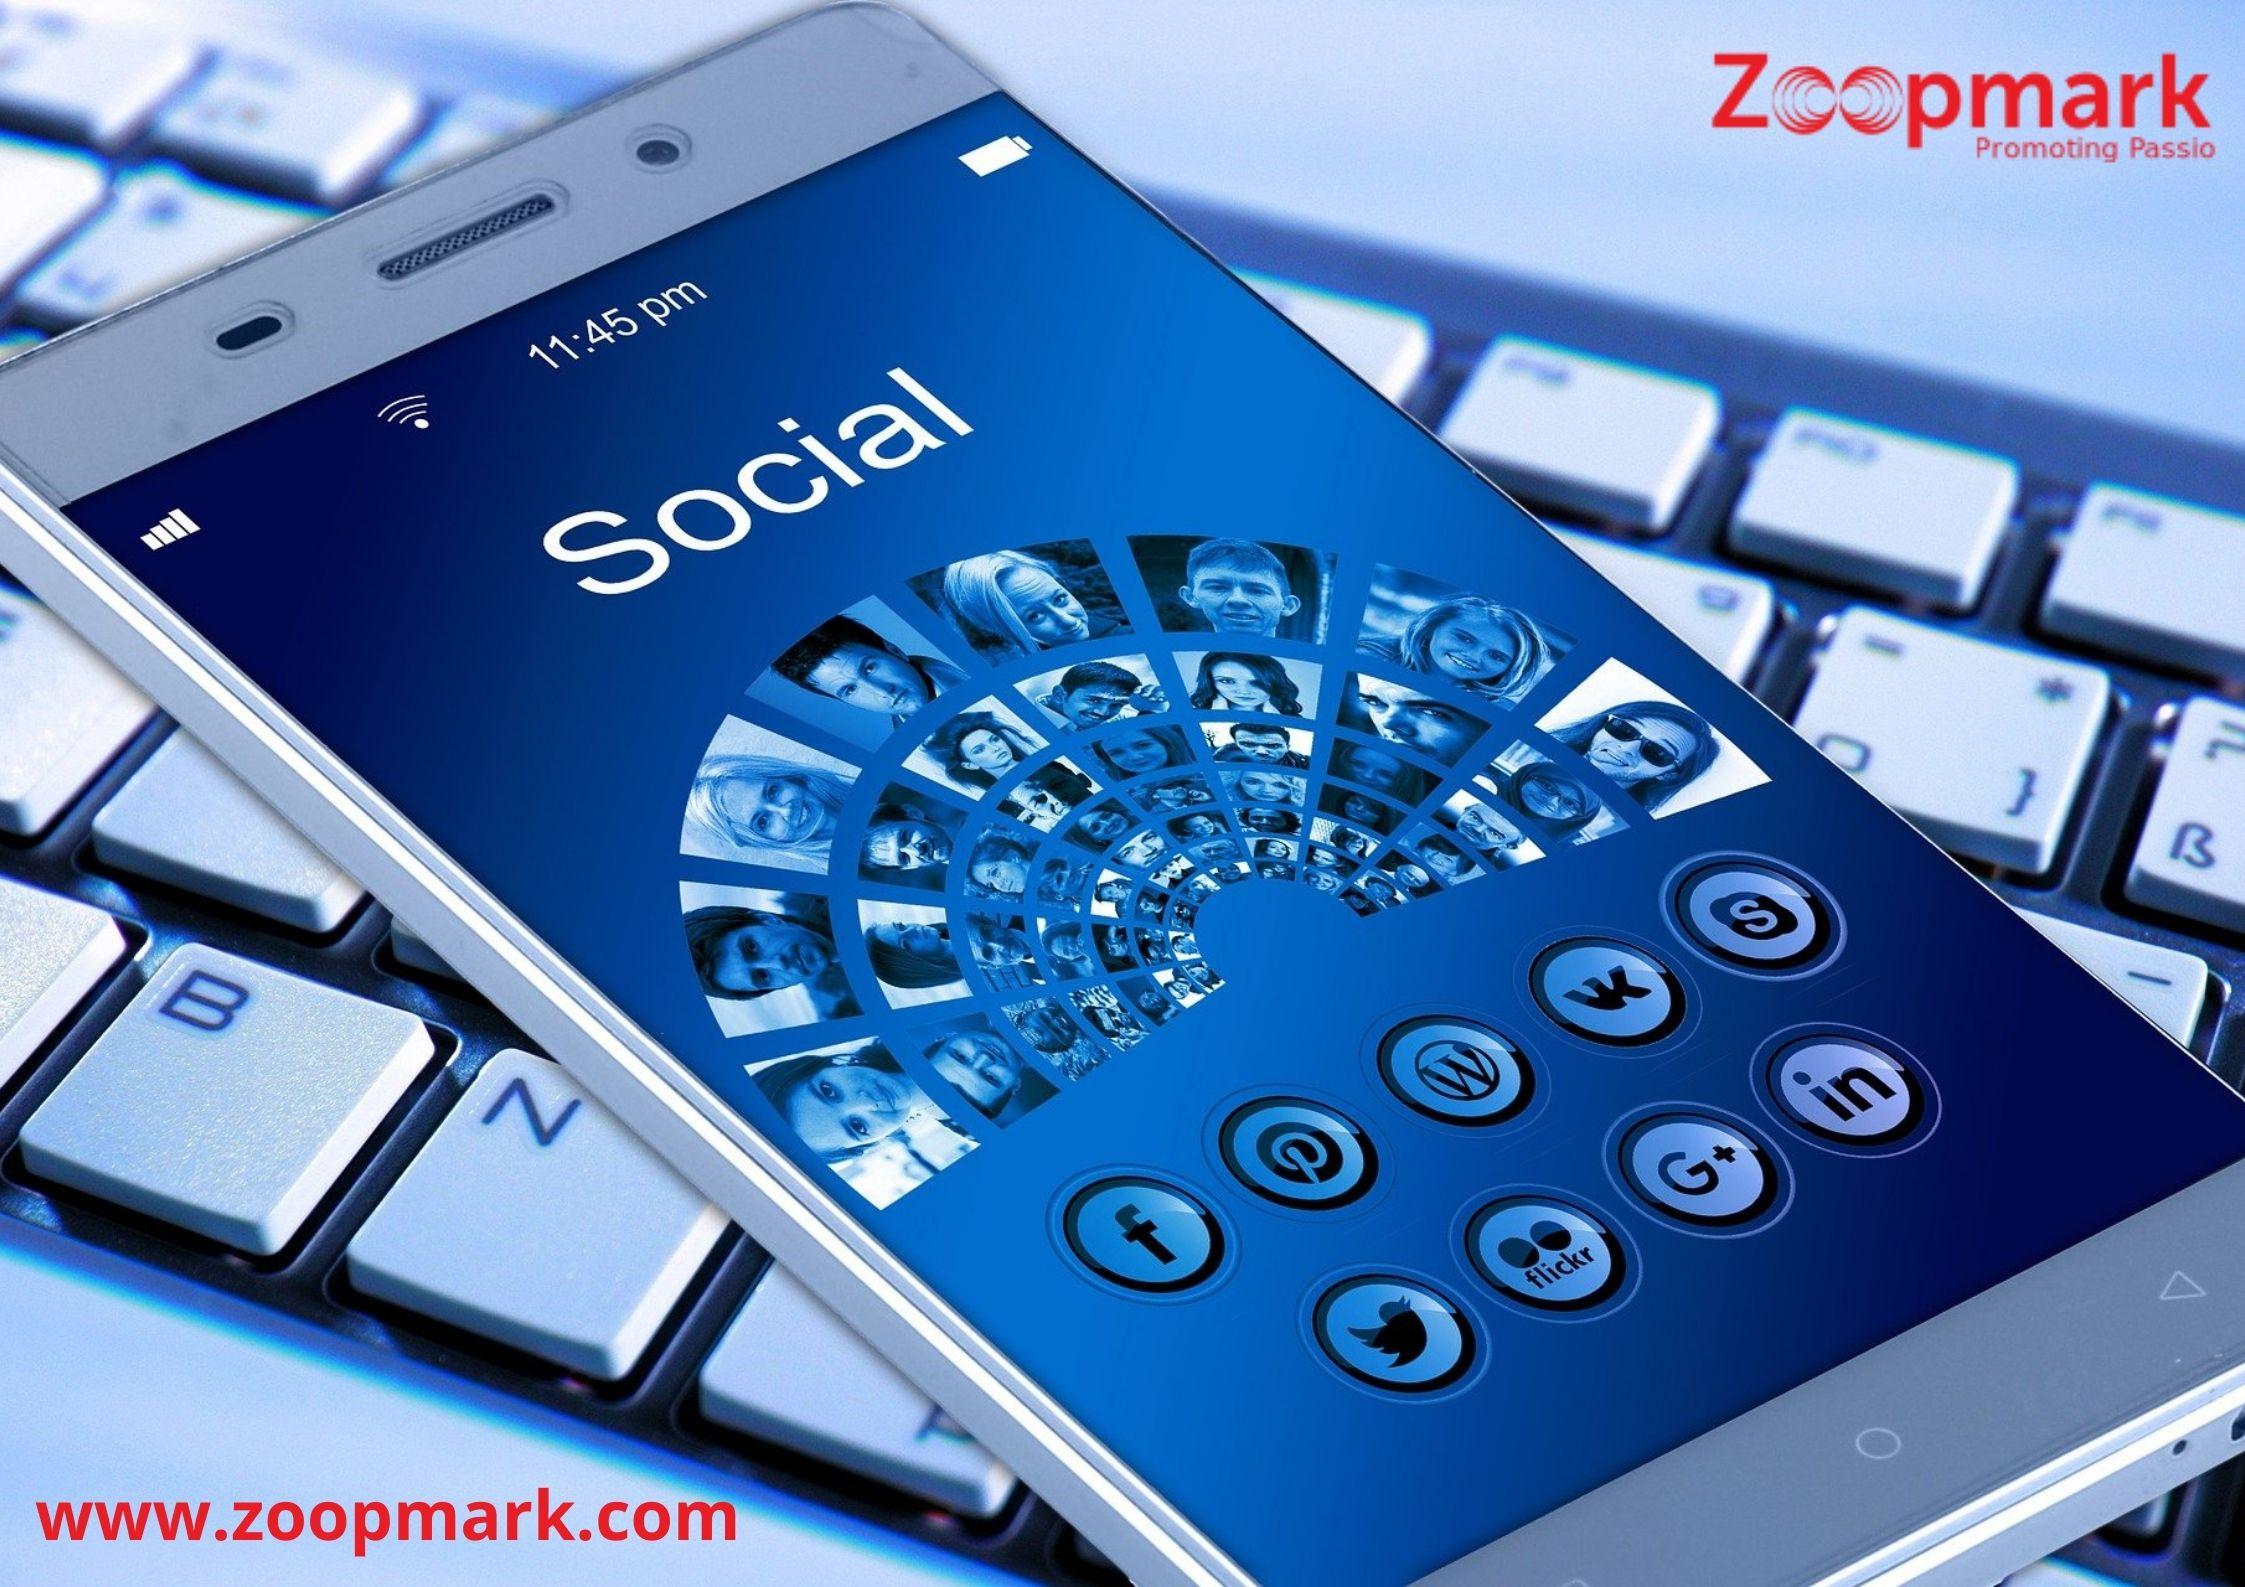 Social Media Marketing Company in Bhubaneswar (Zoopmark)